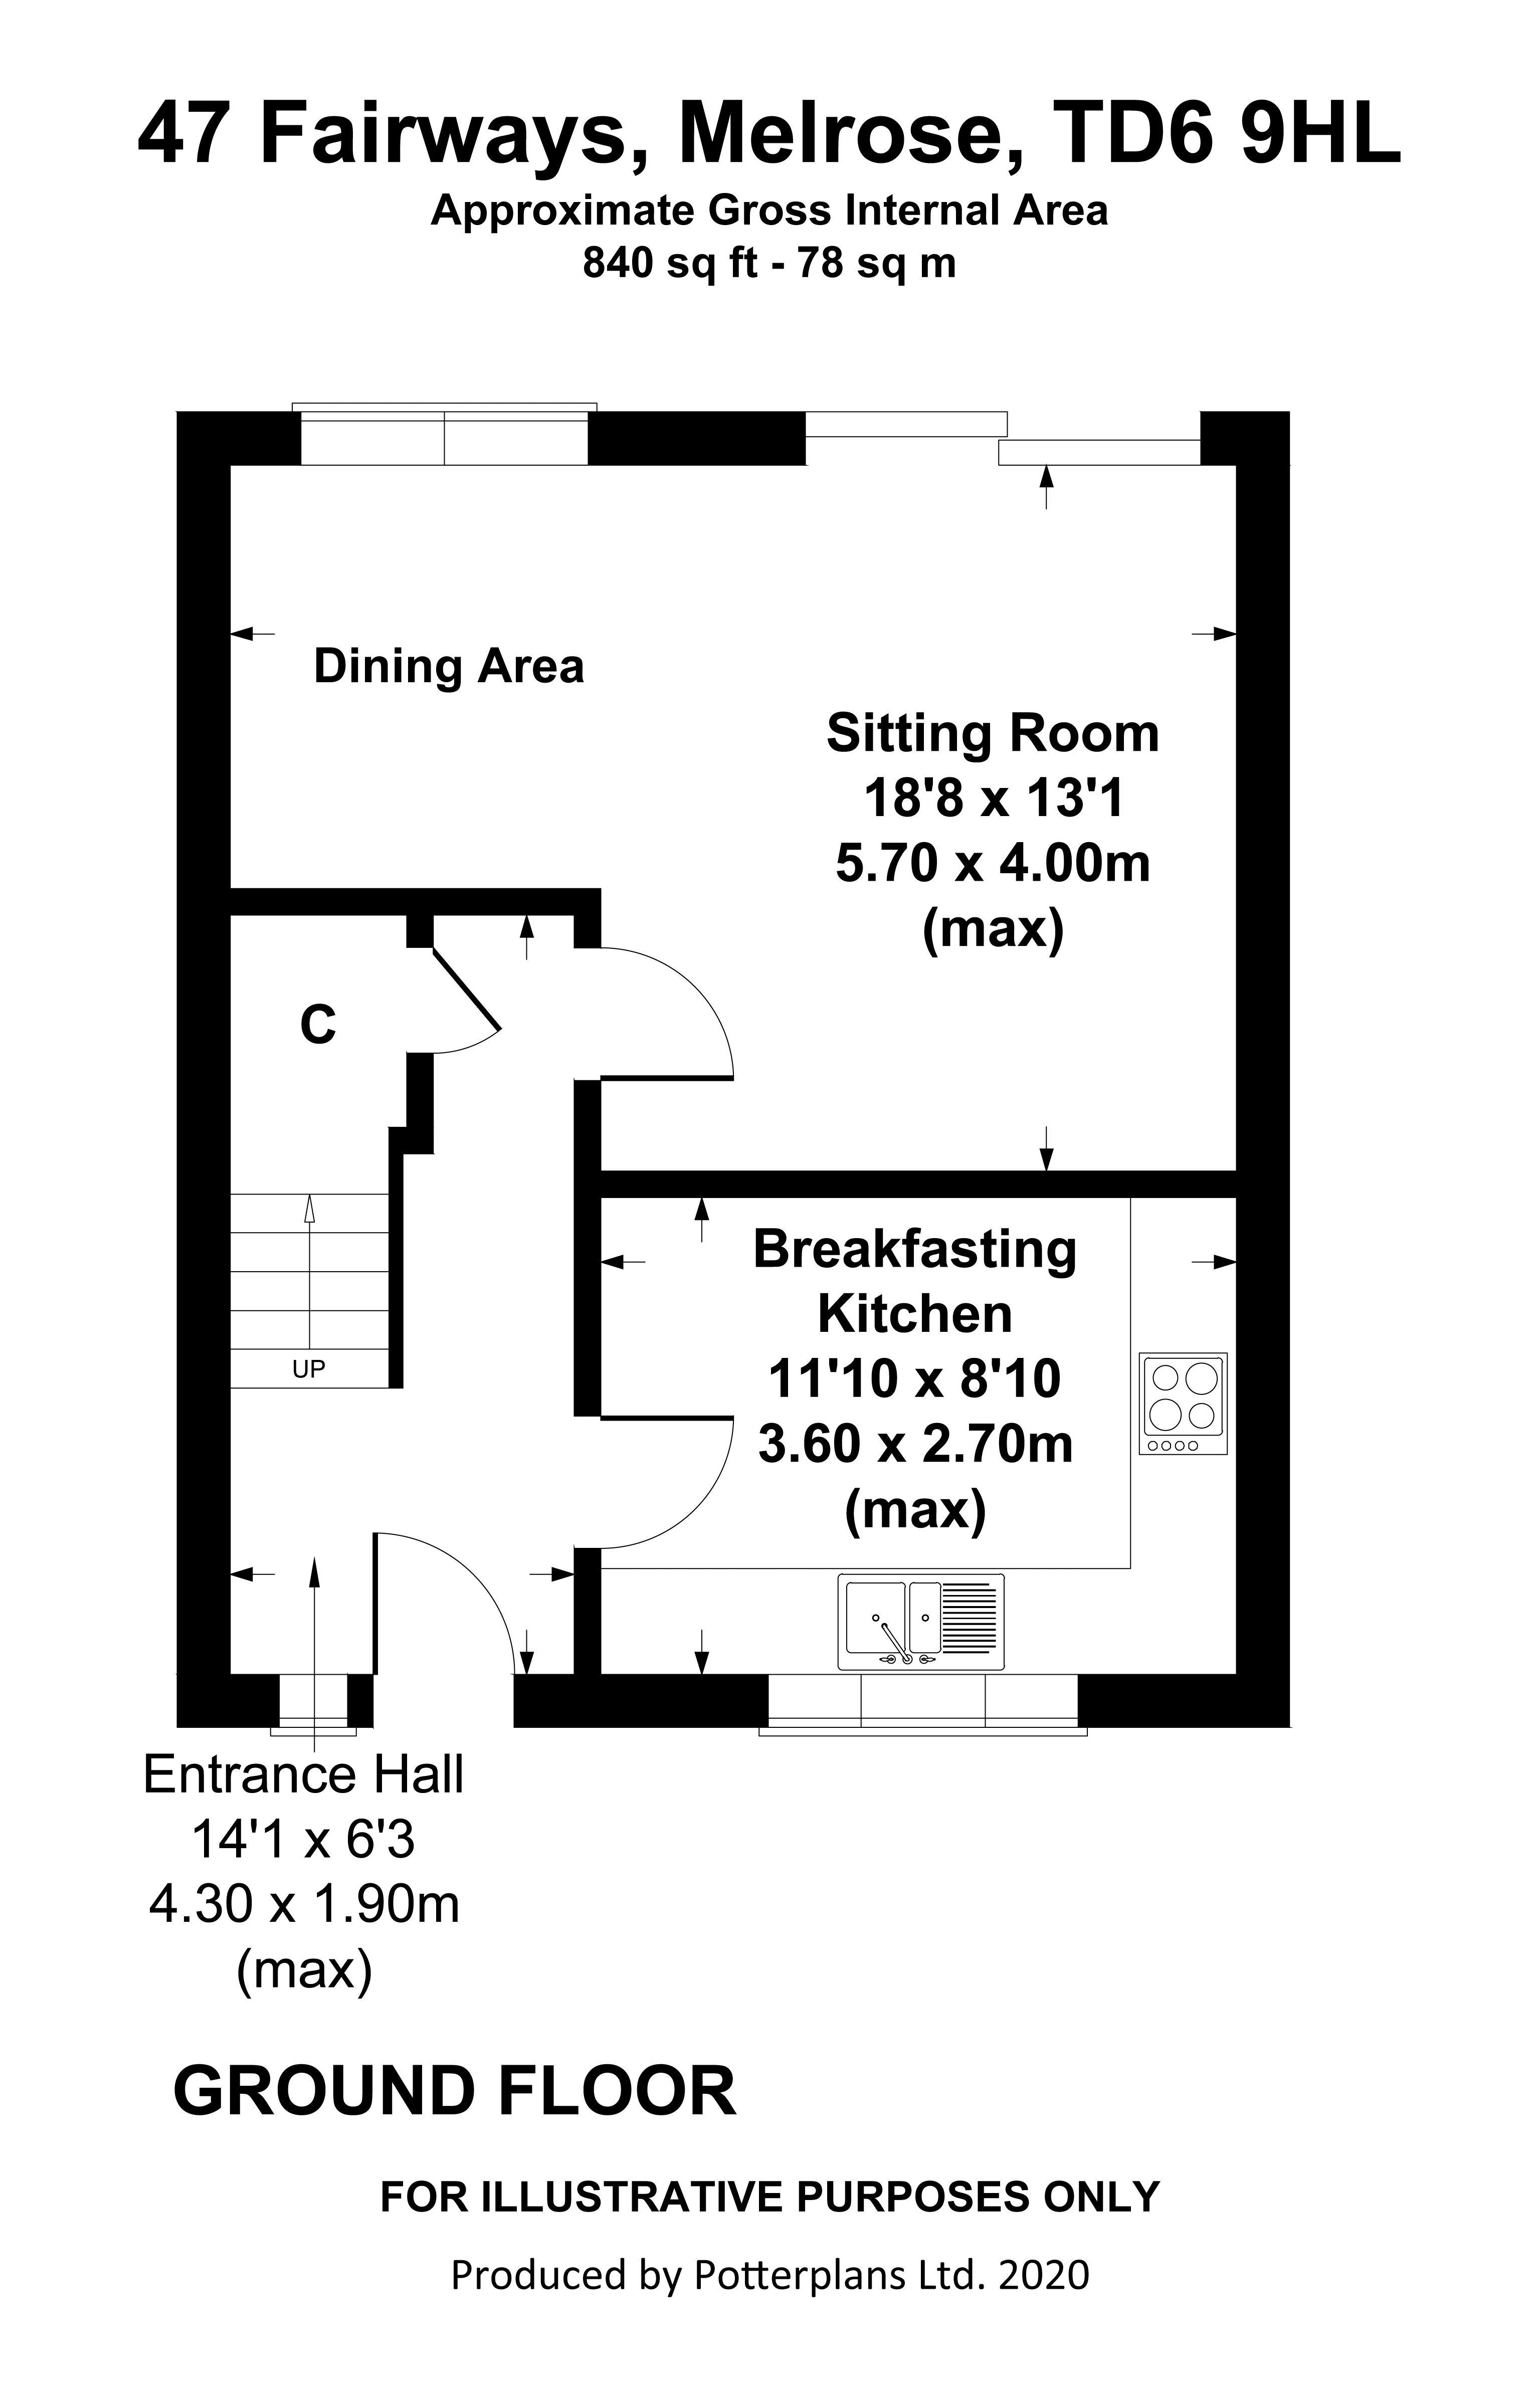 47 Fairways Ground Floor